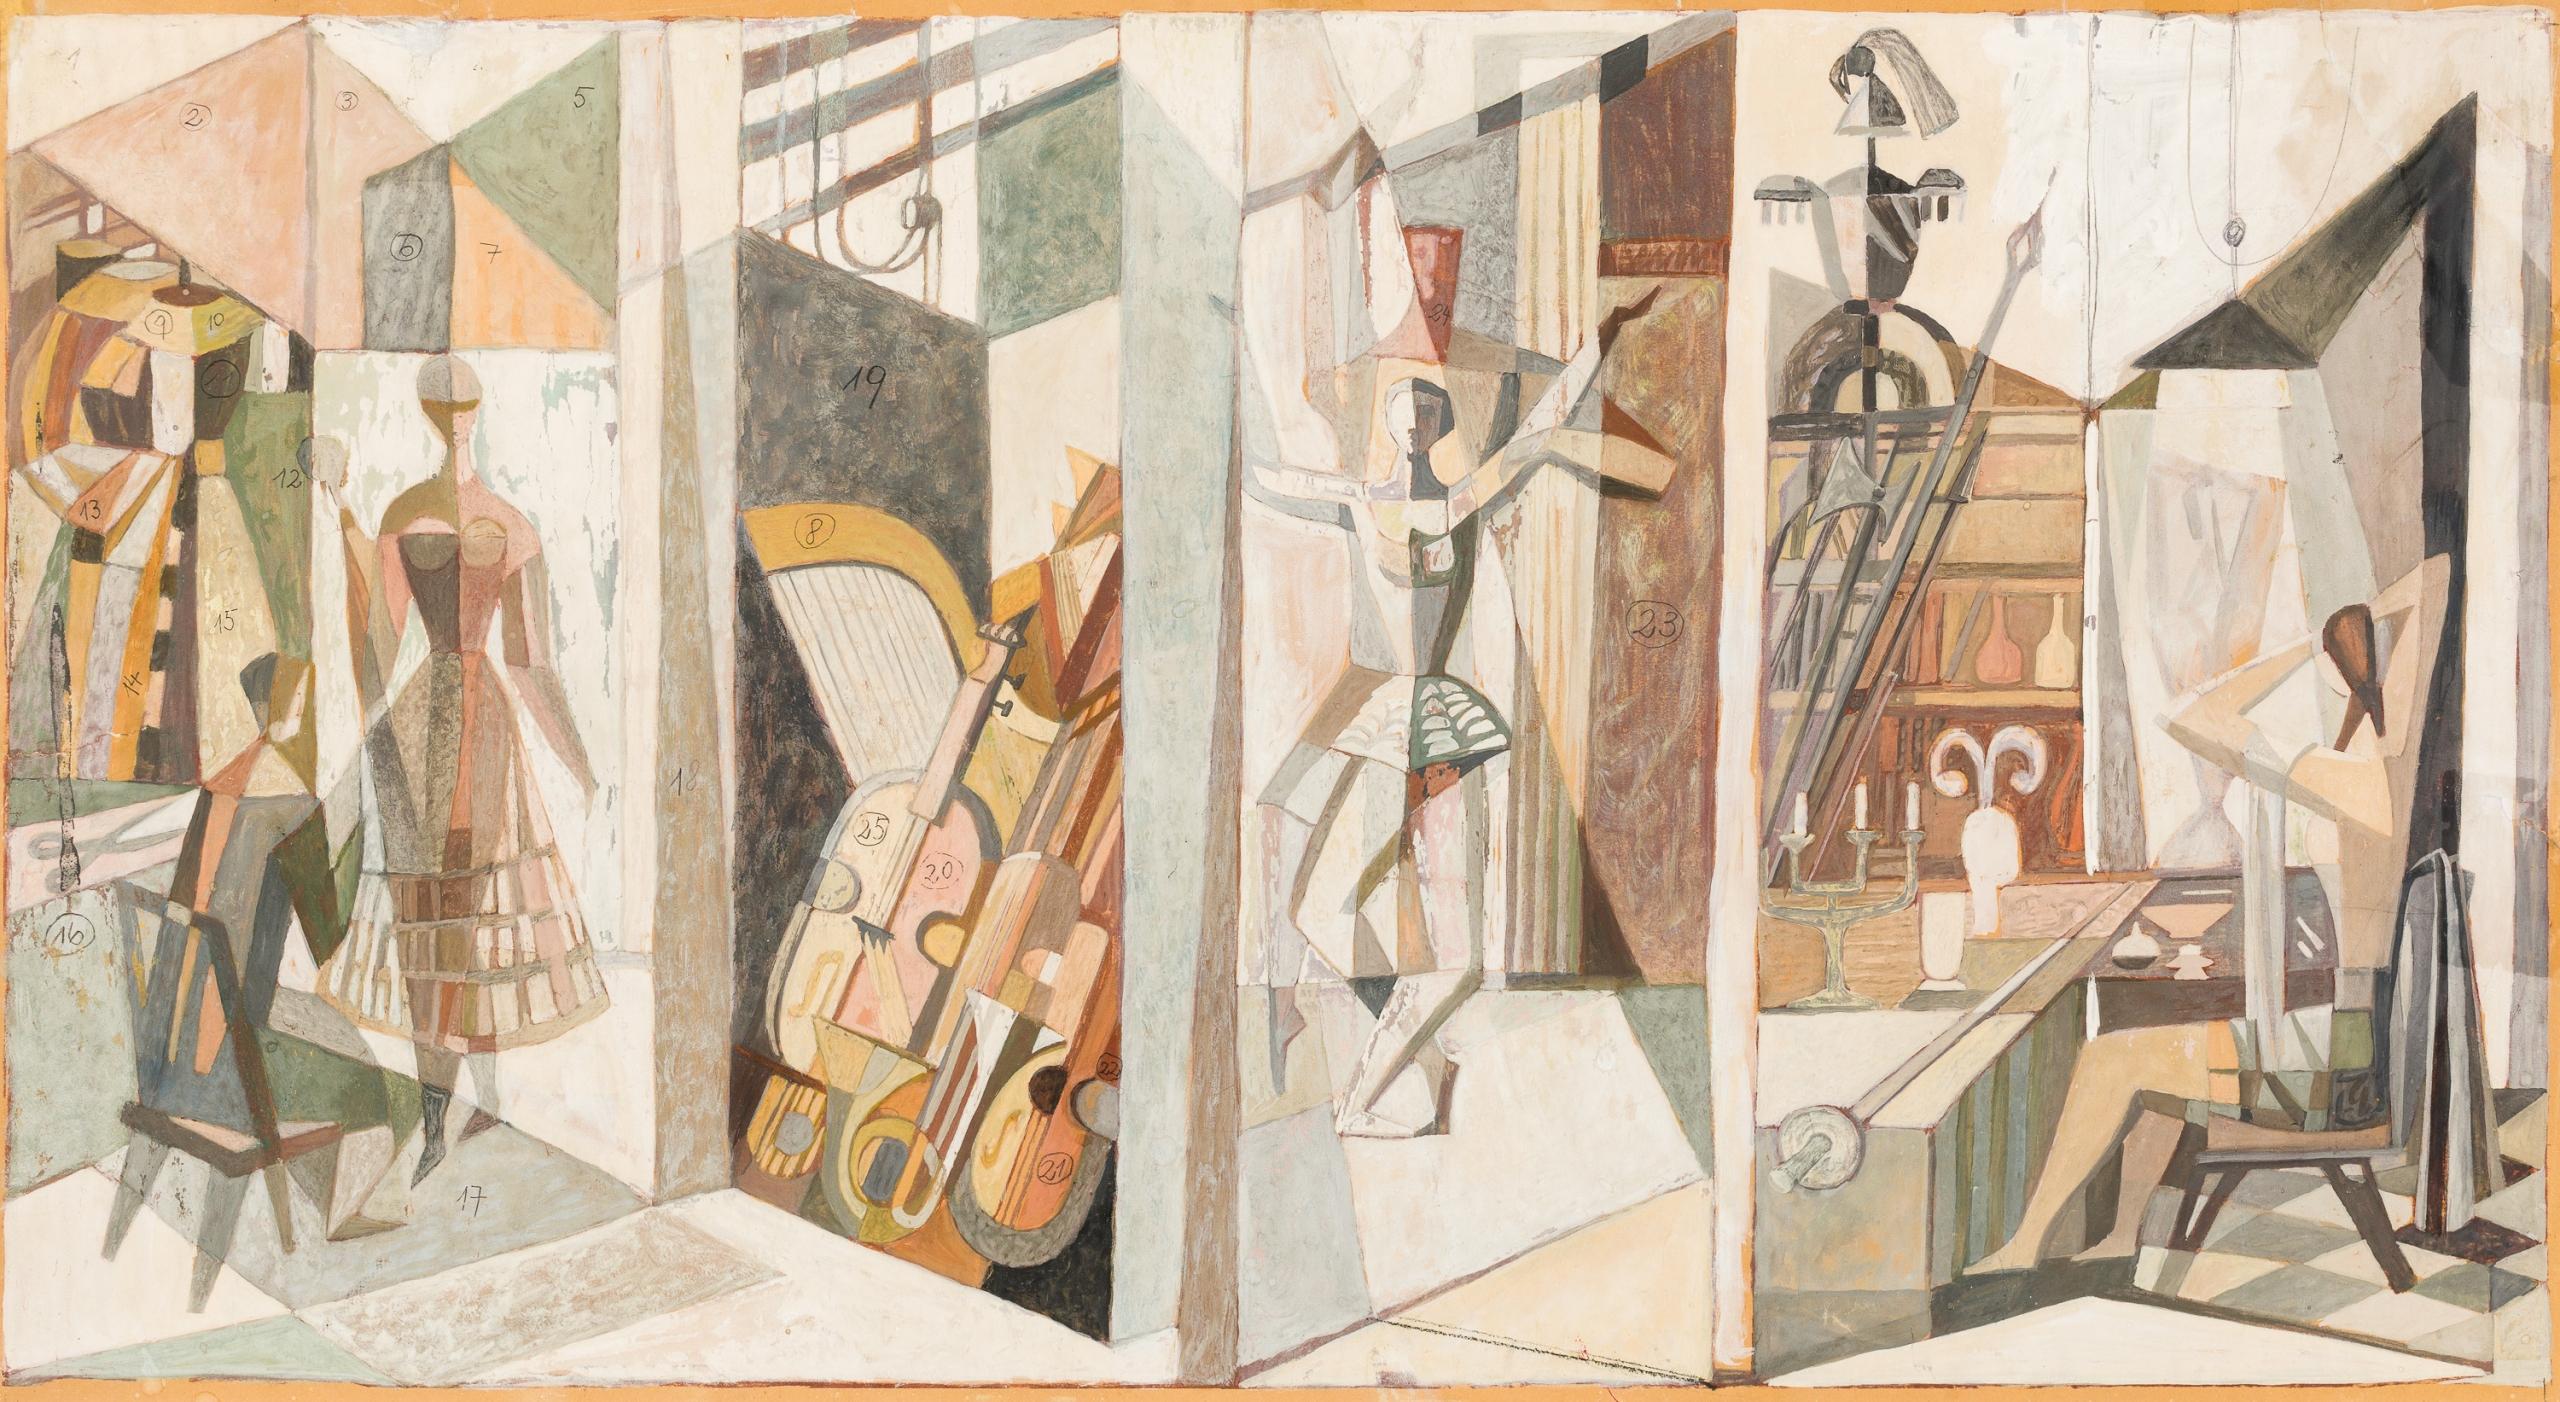 Heinz Leinfellner, Entwürfe für das Mosaik in der Wiener Staatsoper (2 Werke / two works)